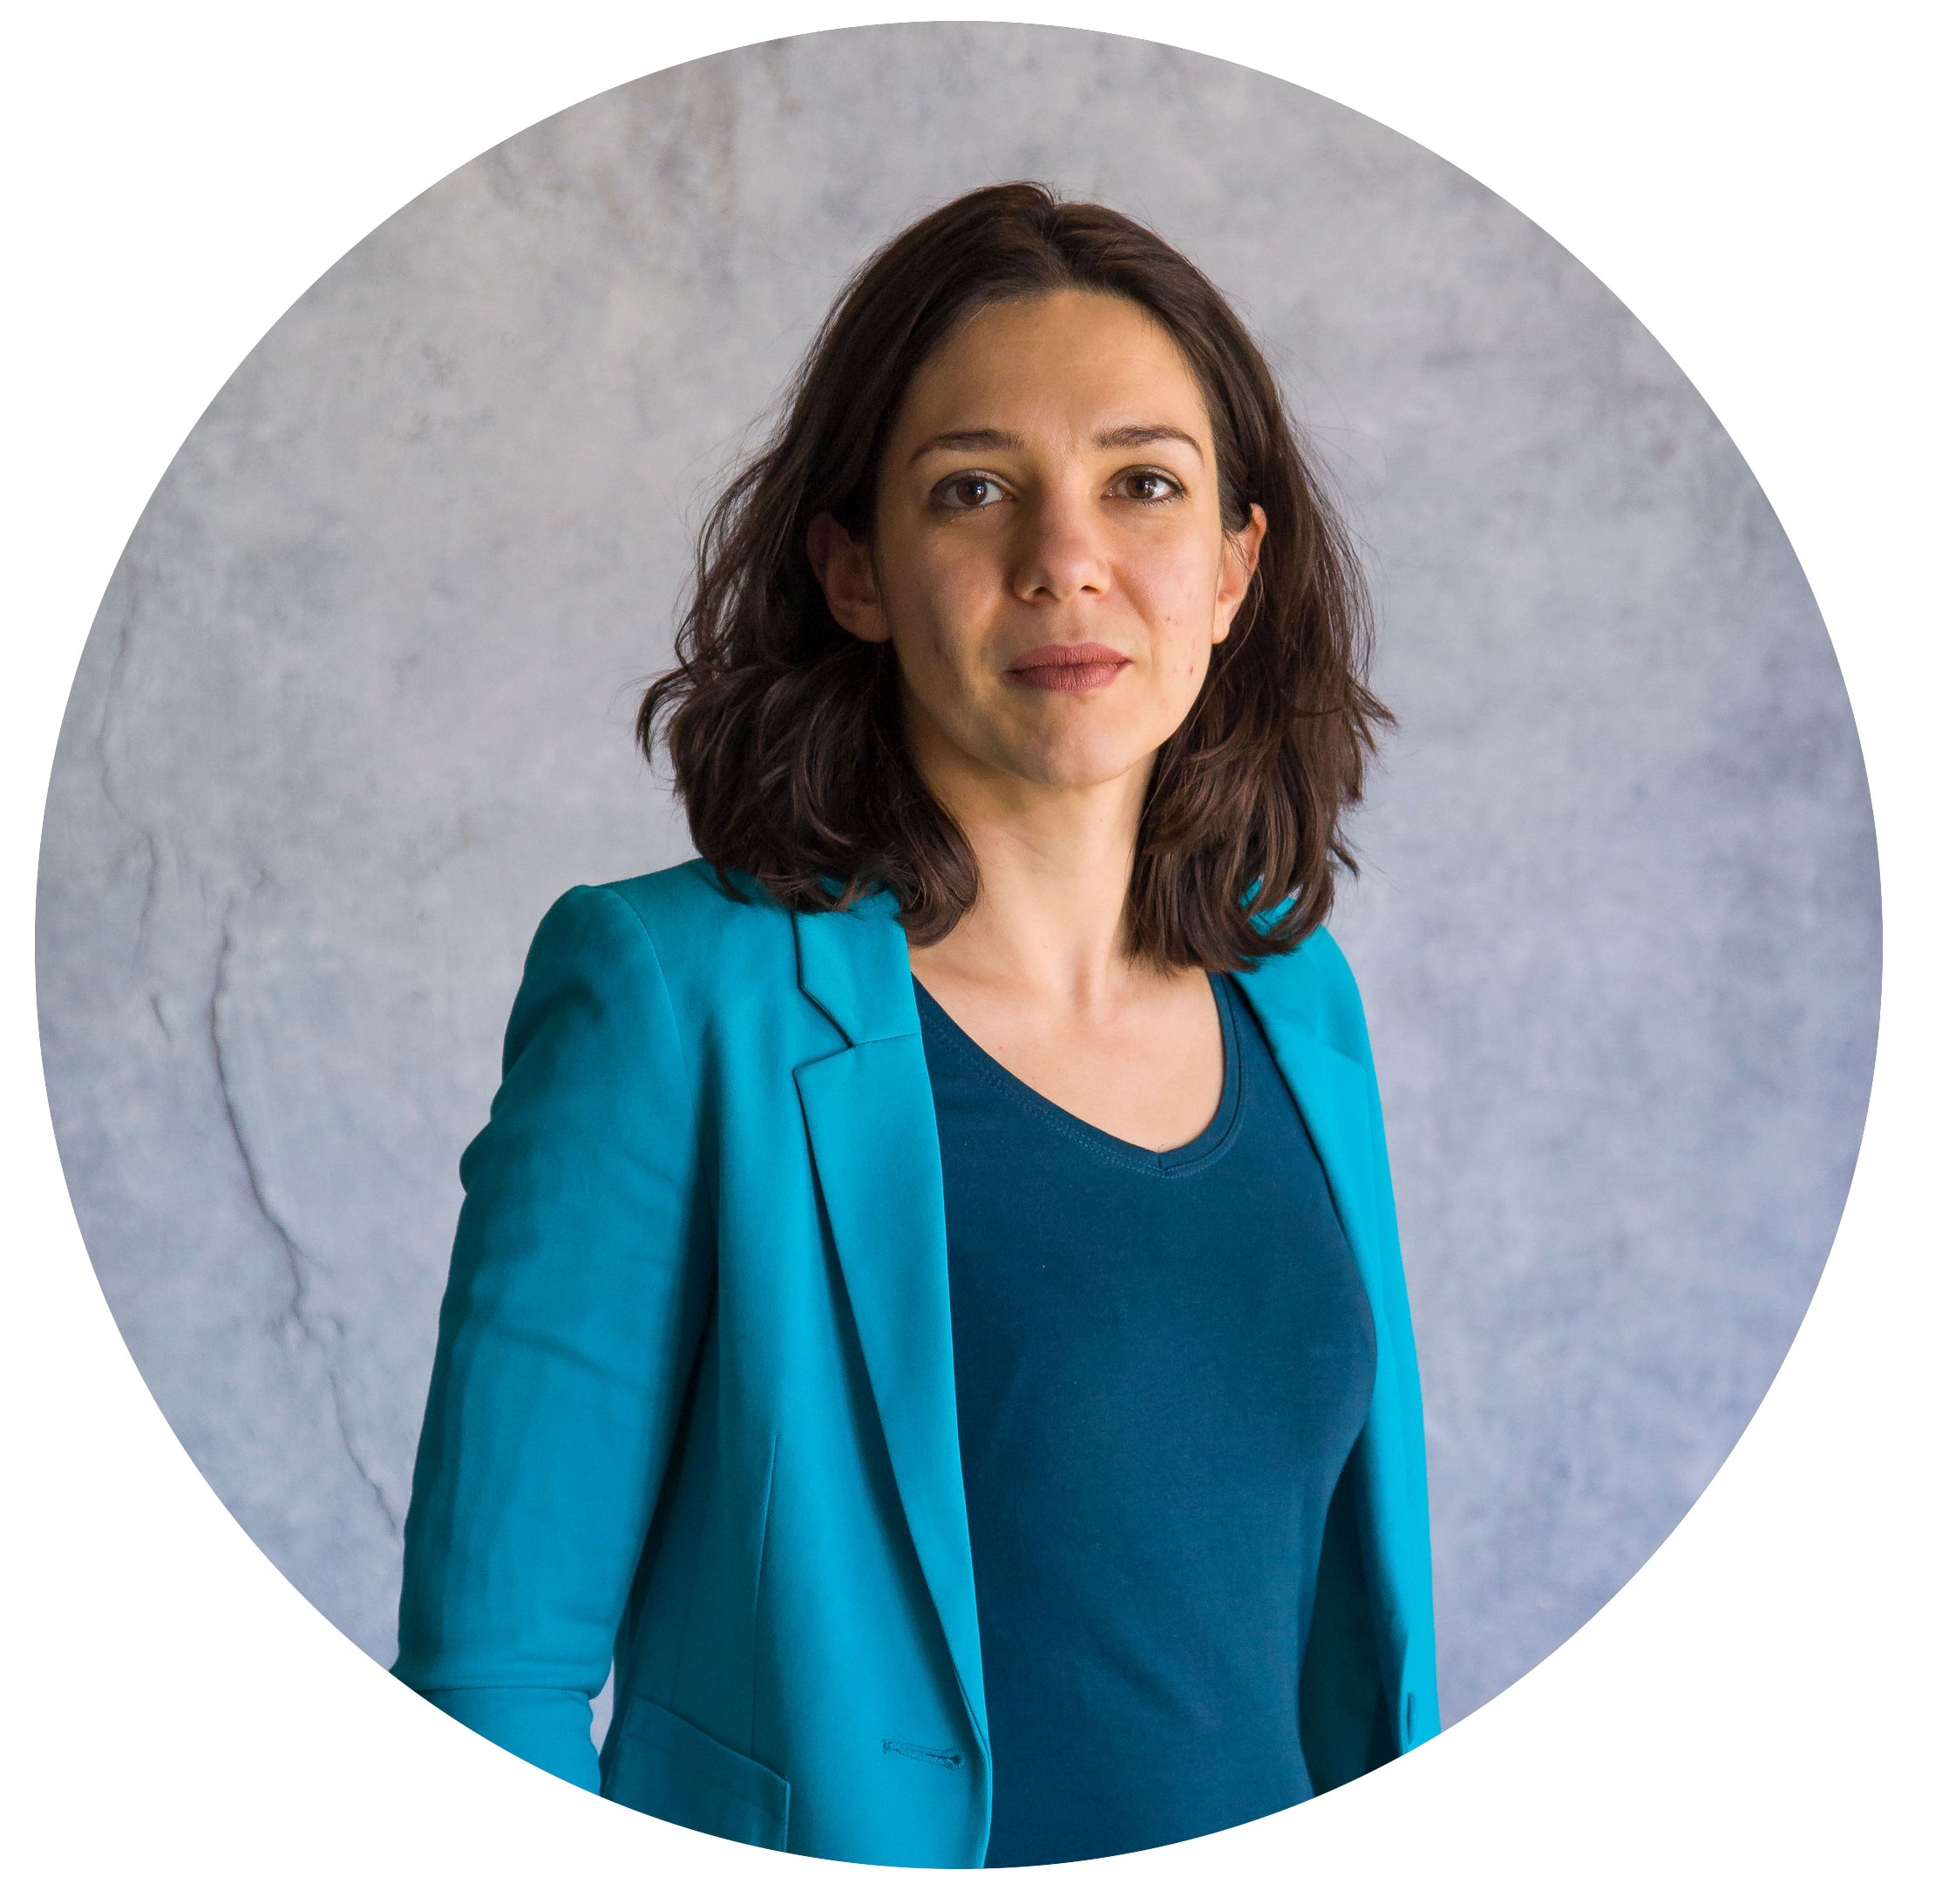 Анета Калчева